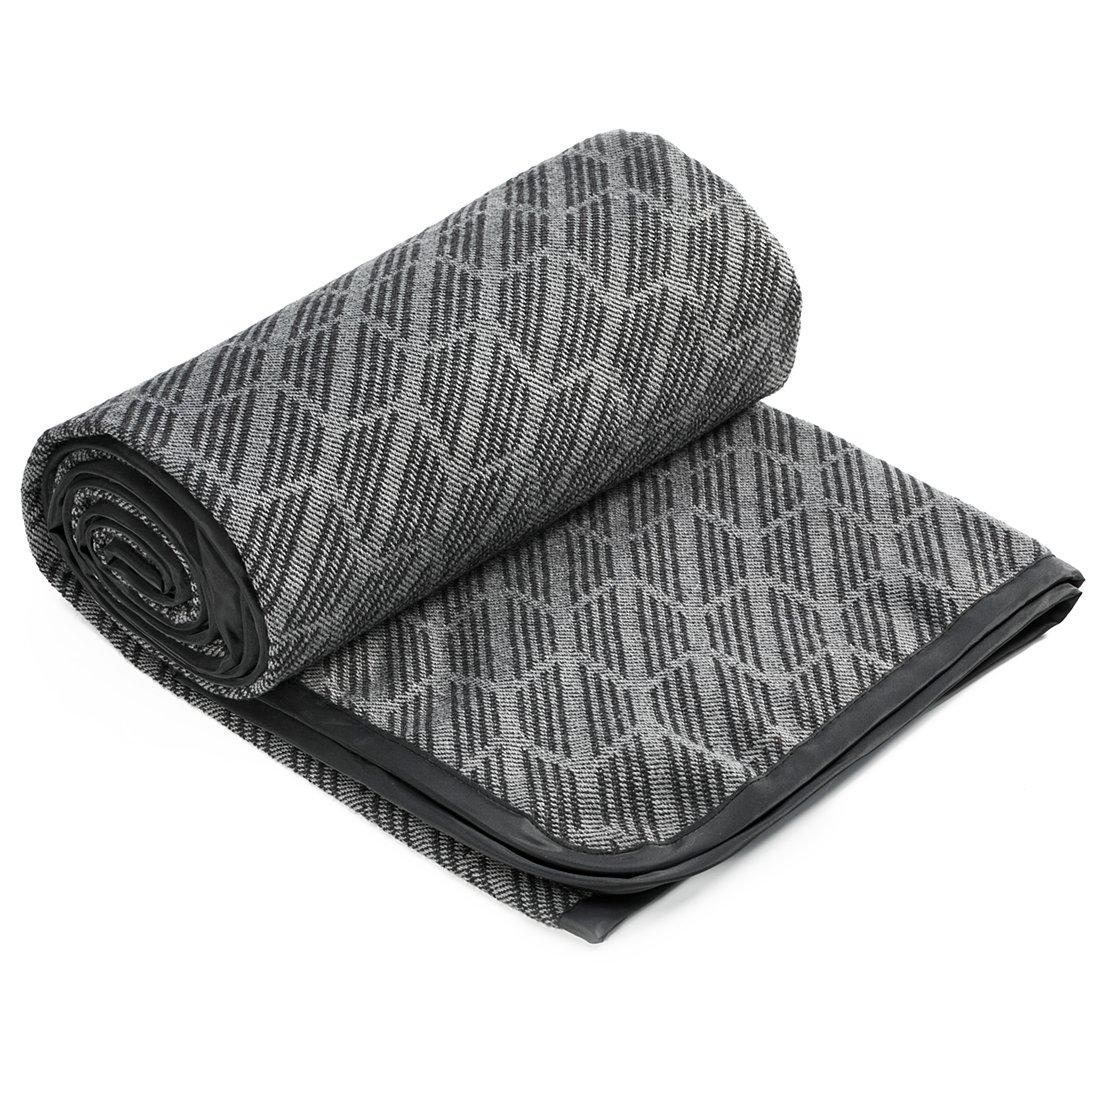 SPENCER&WHITNEY Picnic Blanket Waterproof 10% Wool/90% POLYESTER Large Waterproof Picnic Blanket All-Purpose Foldable Fleece Picnic Blanket